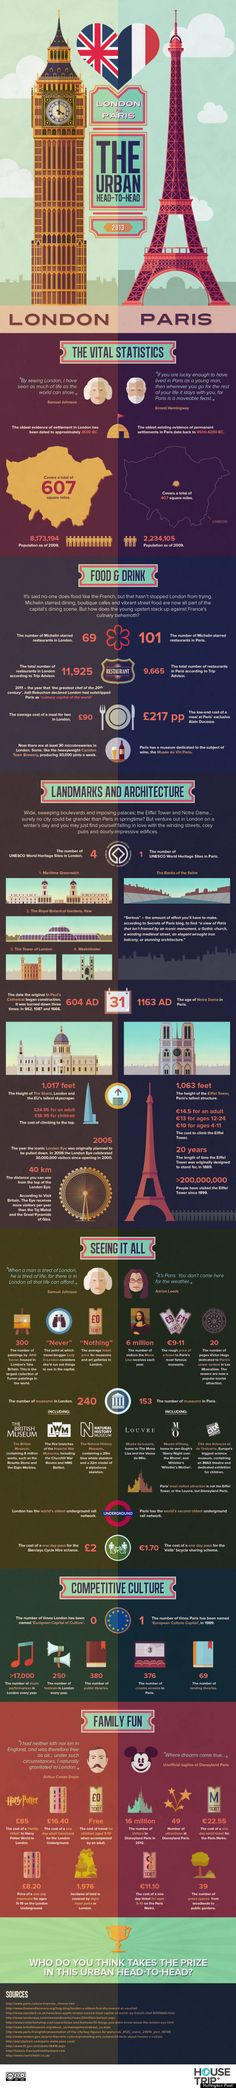 london vs paris